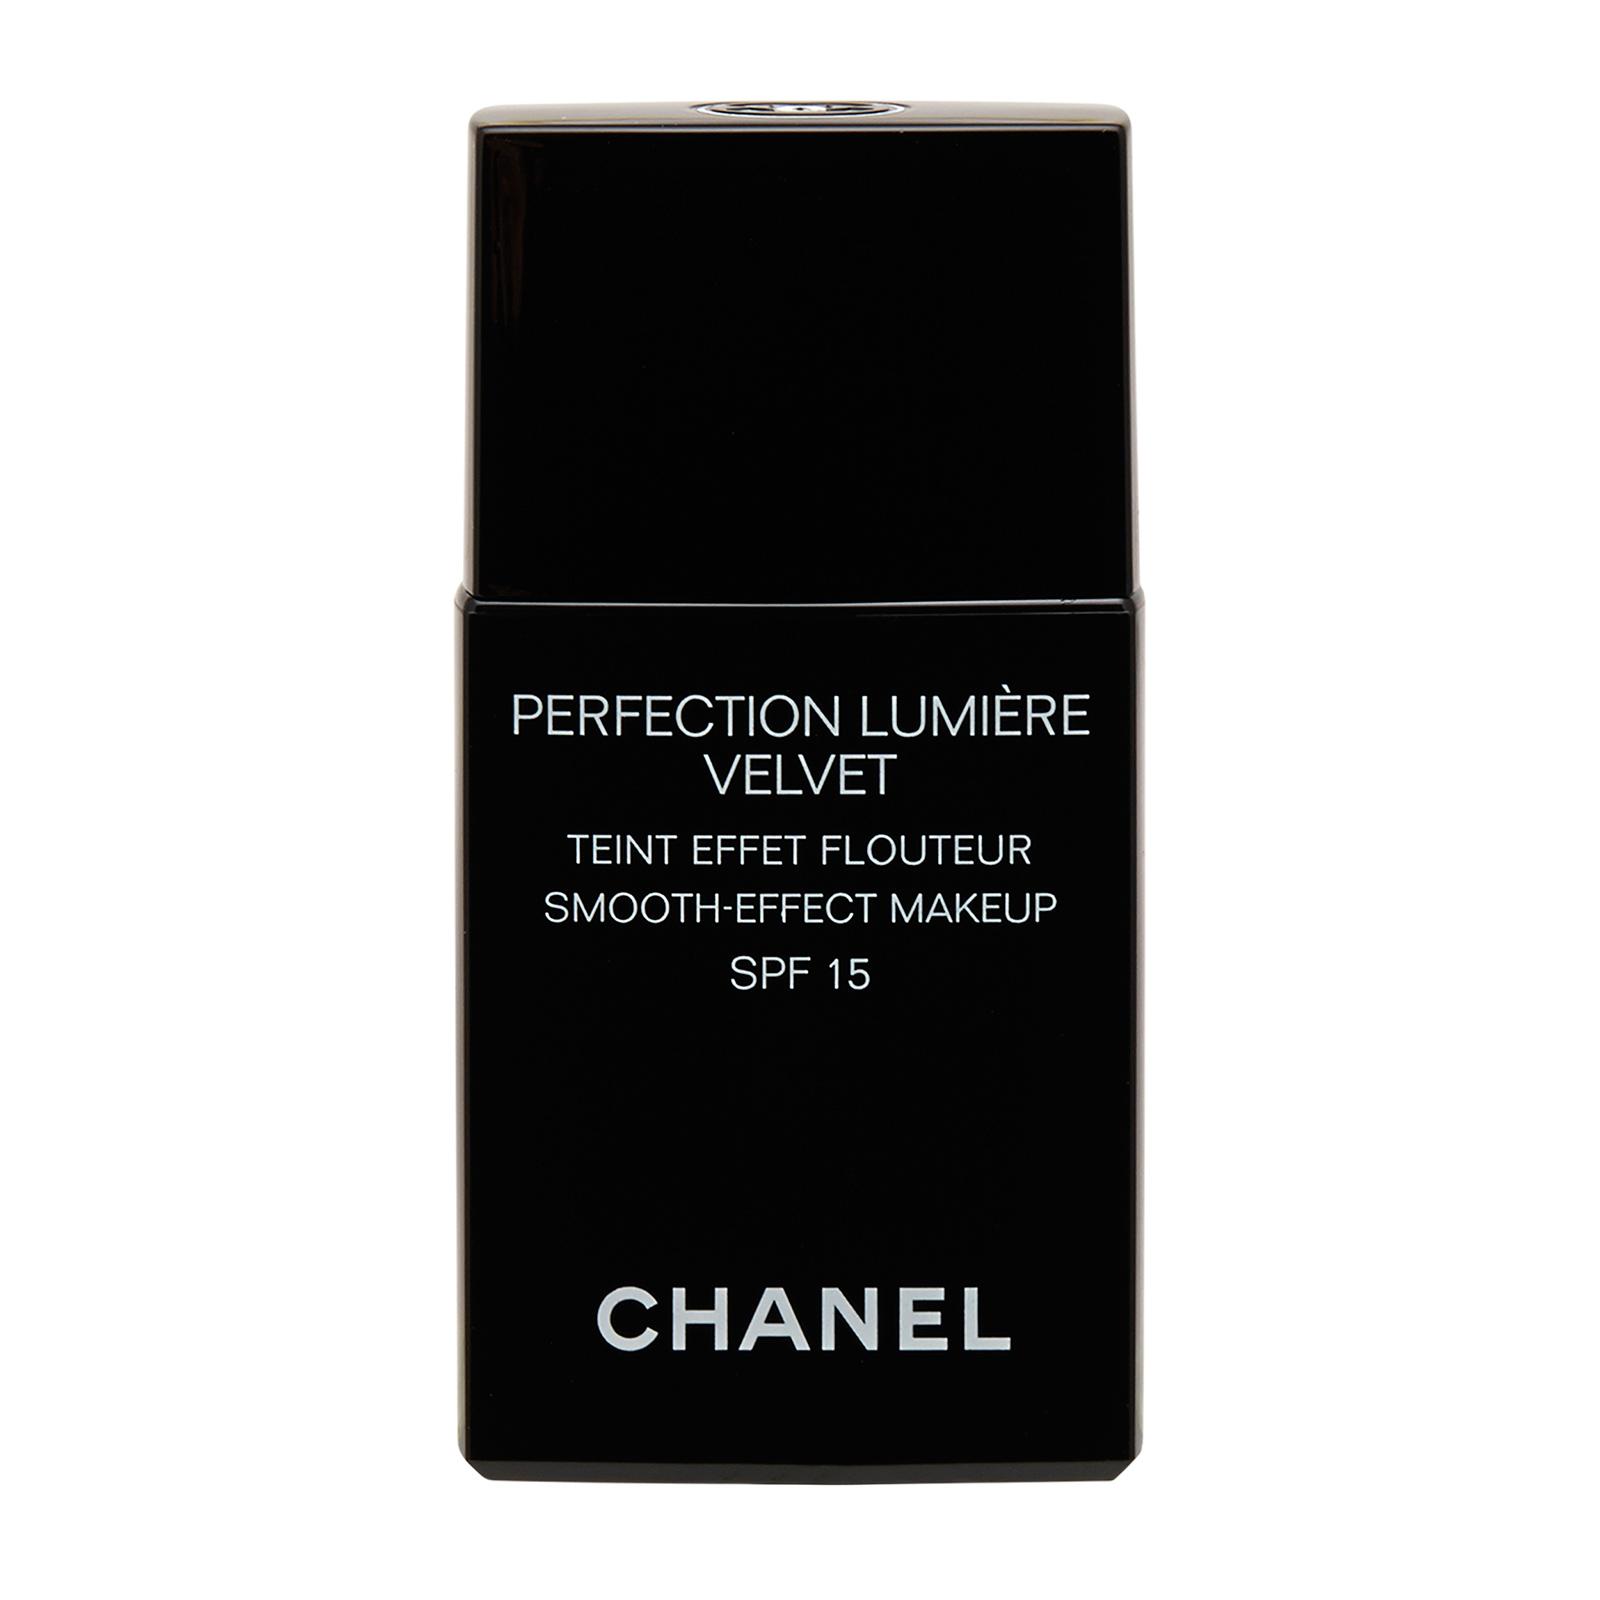 Chanel Perfection Lumiere Velvet  Smooth-Effect Makeup SPF 15 20 Beige, 1oz, 30ml